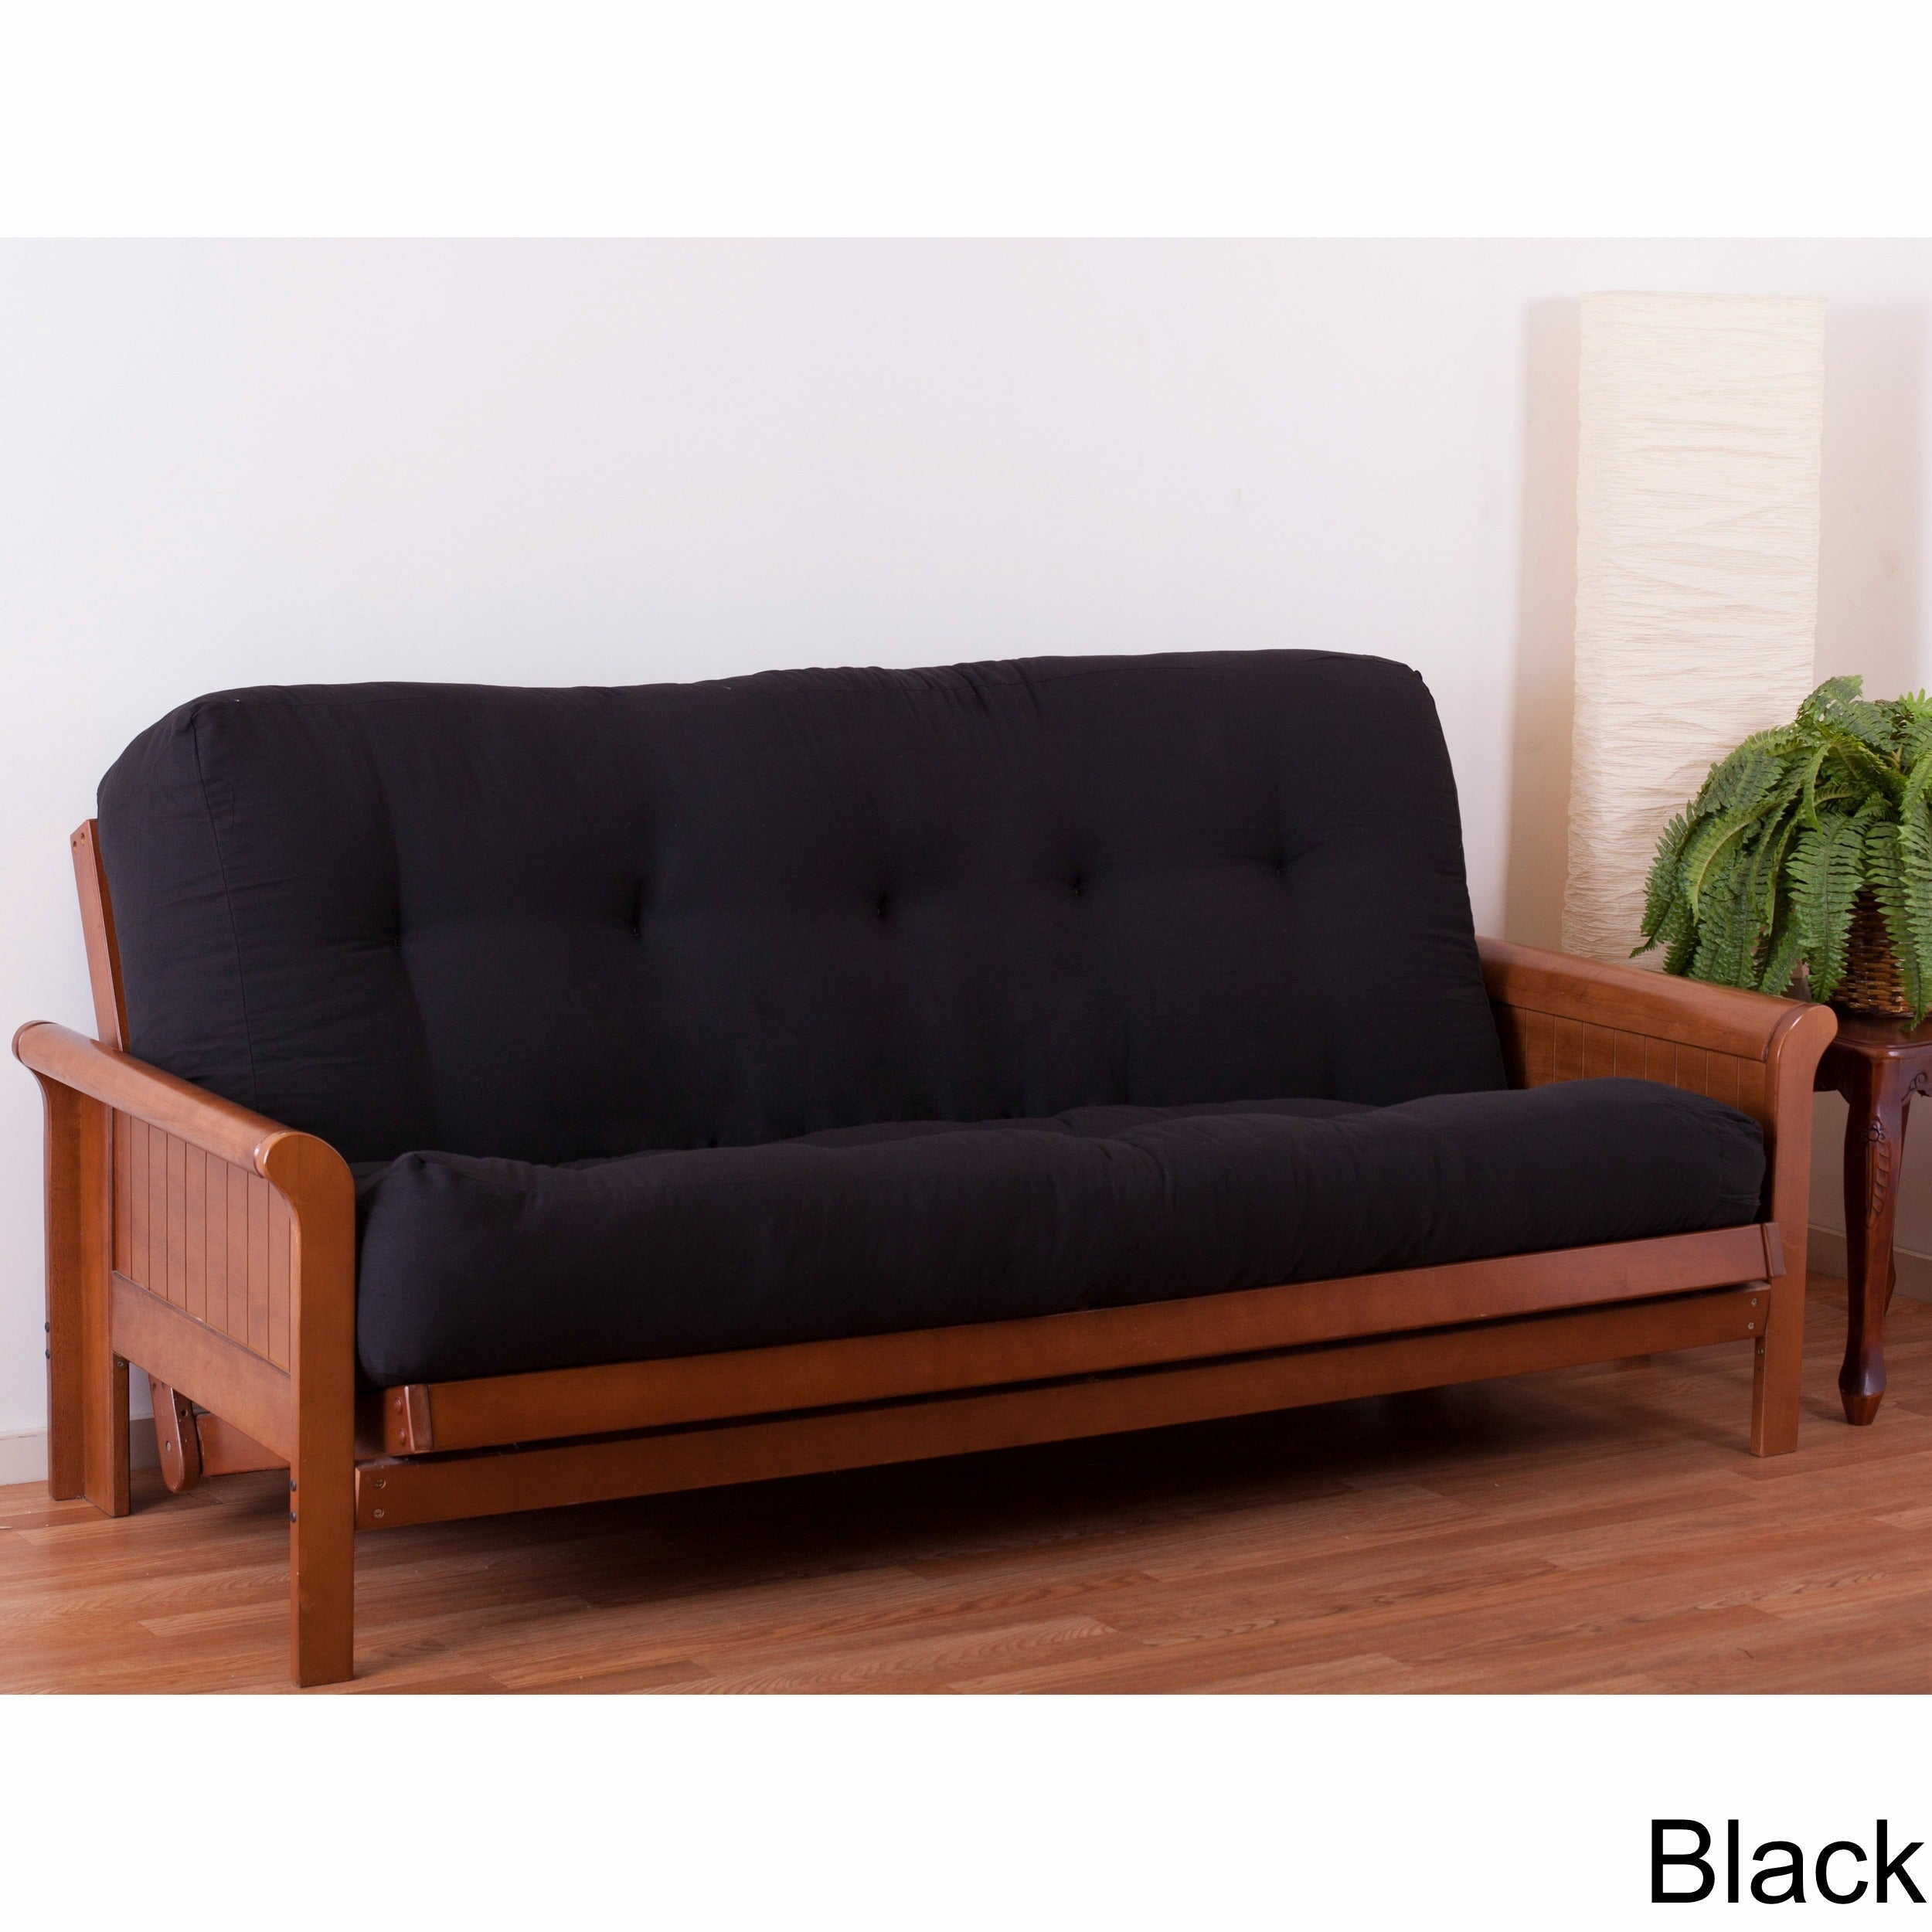 stens h organic mattress sleep store futons home beds natural futon mattresses hastens austin luxury product